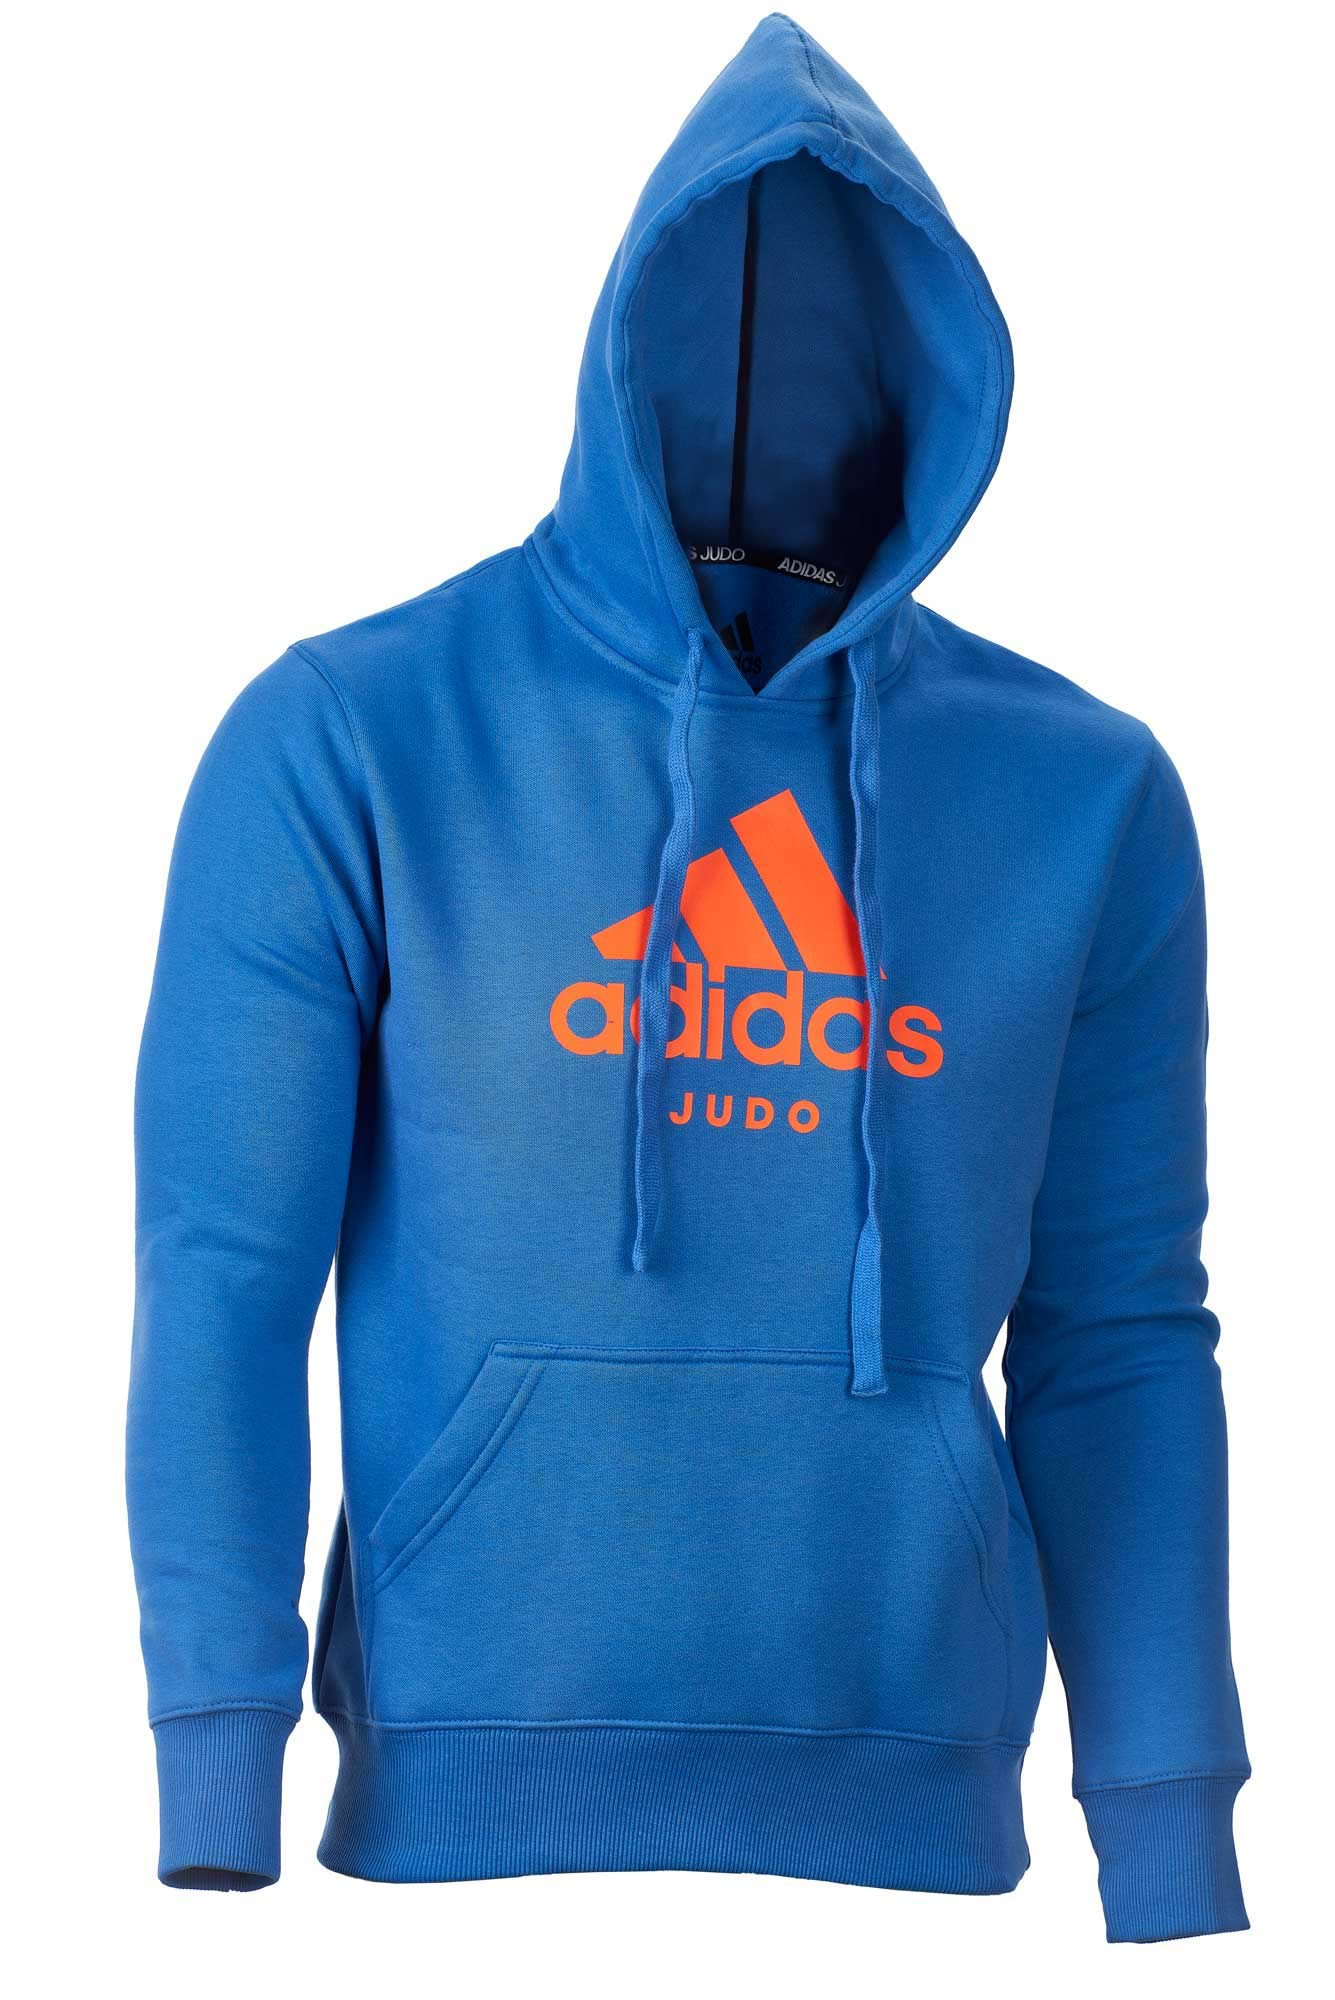 Adidas adidas Community line Hoody Judo \